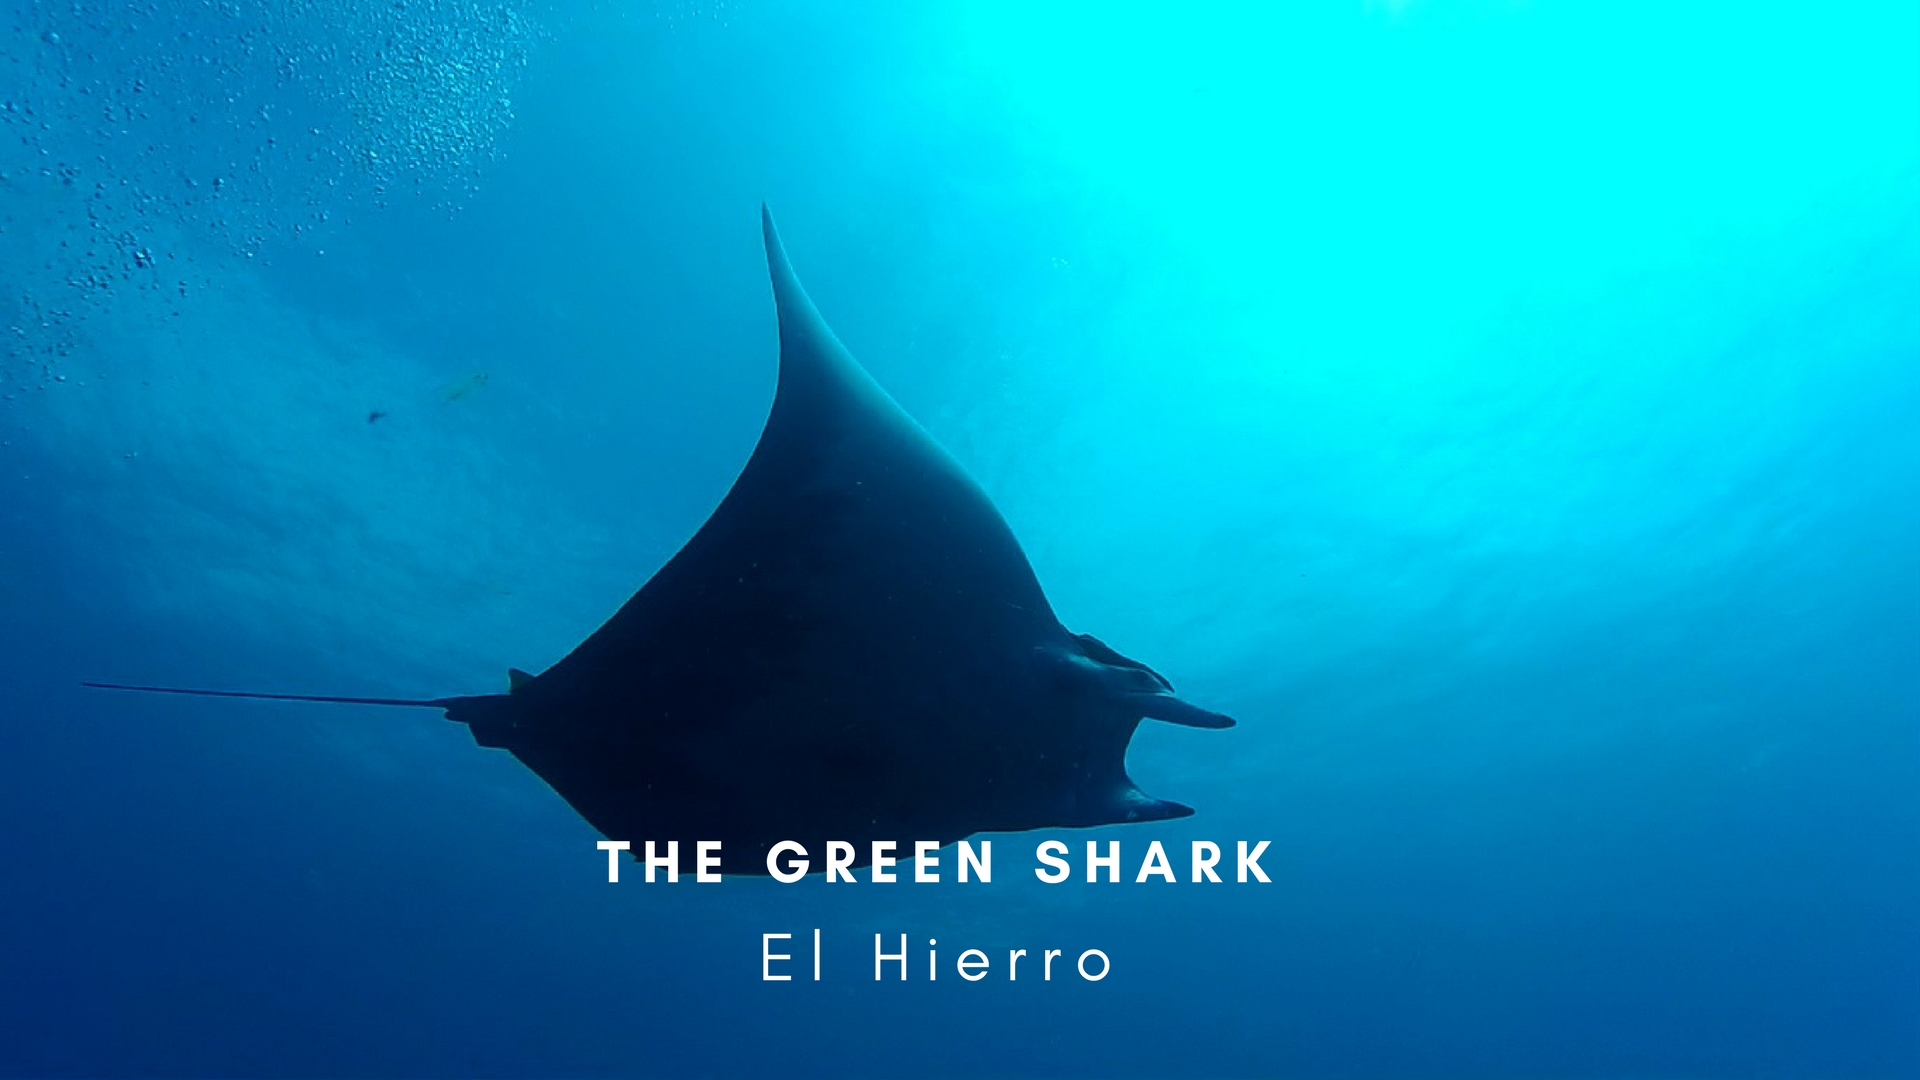 Green Shark El Hierro